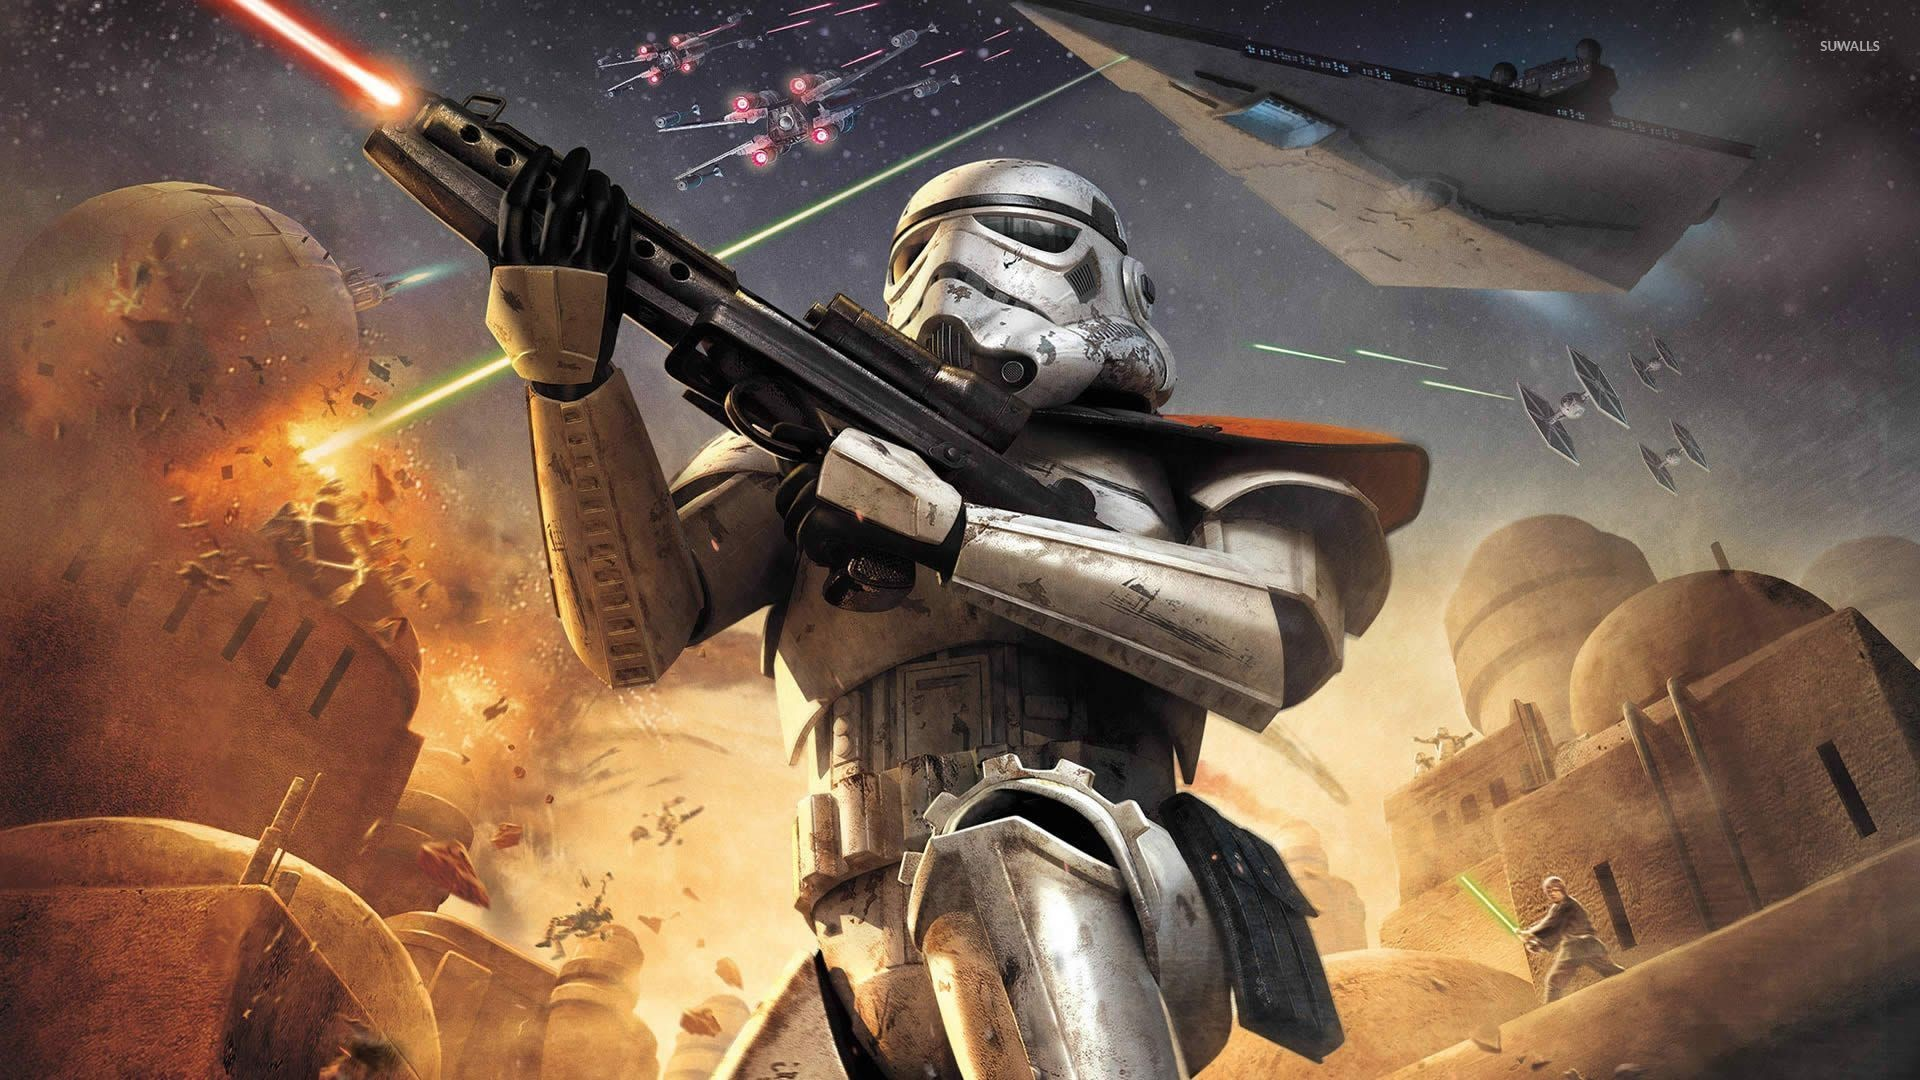 Star Wars Battlefront – Elite Squadron wallpaper jpg